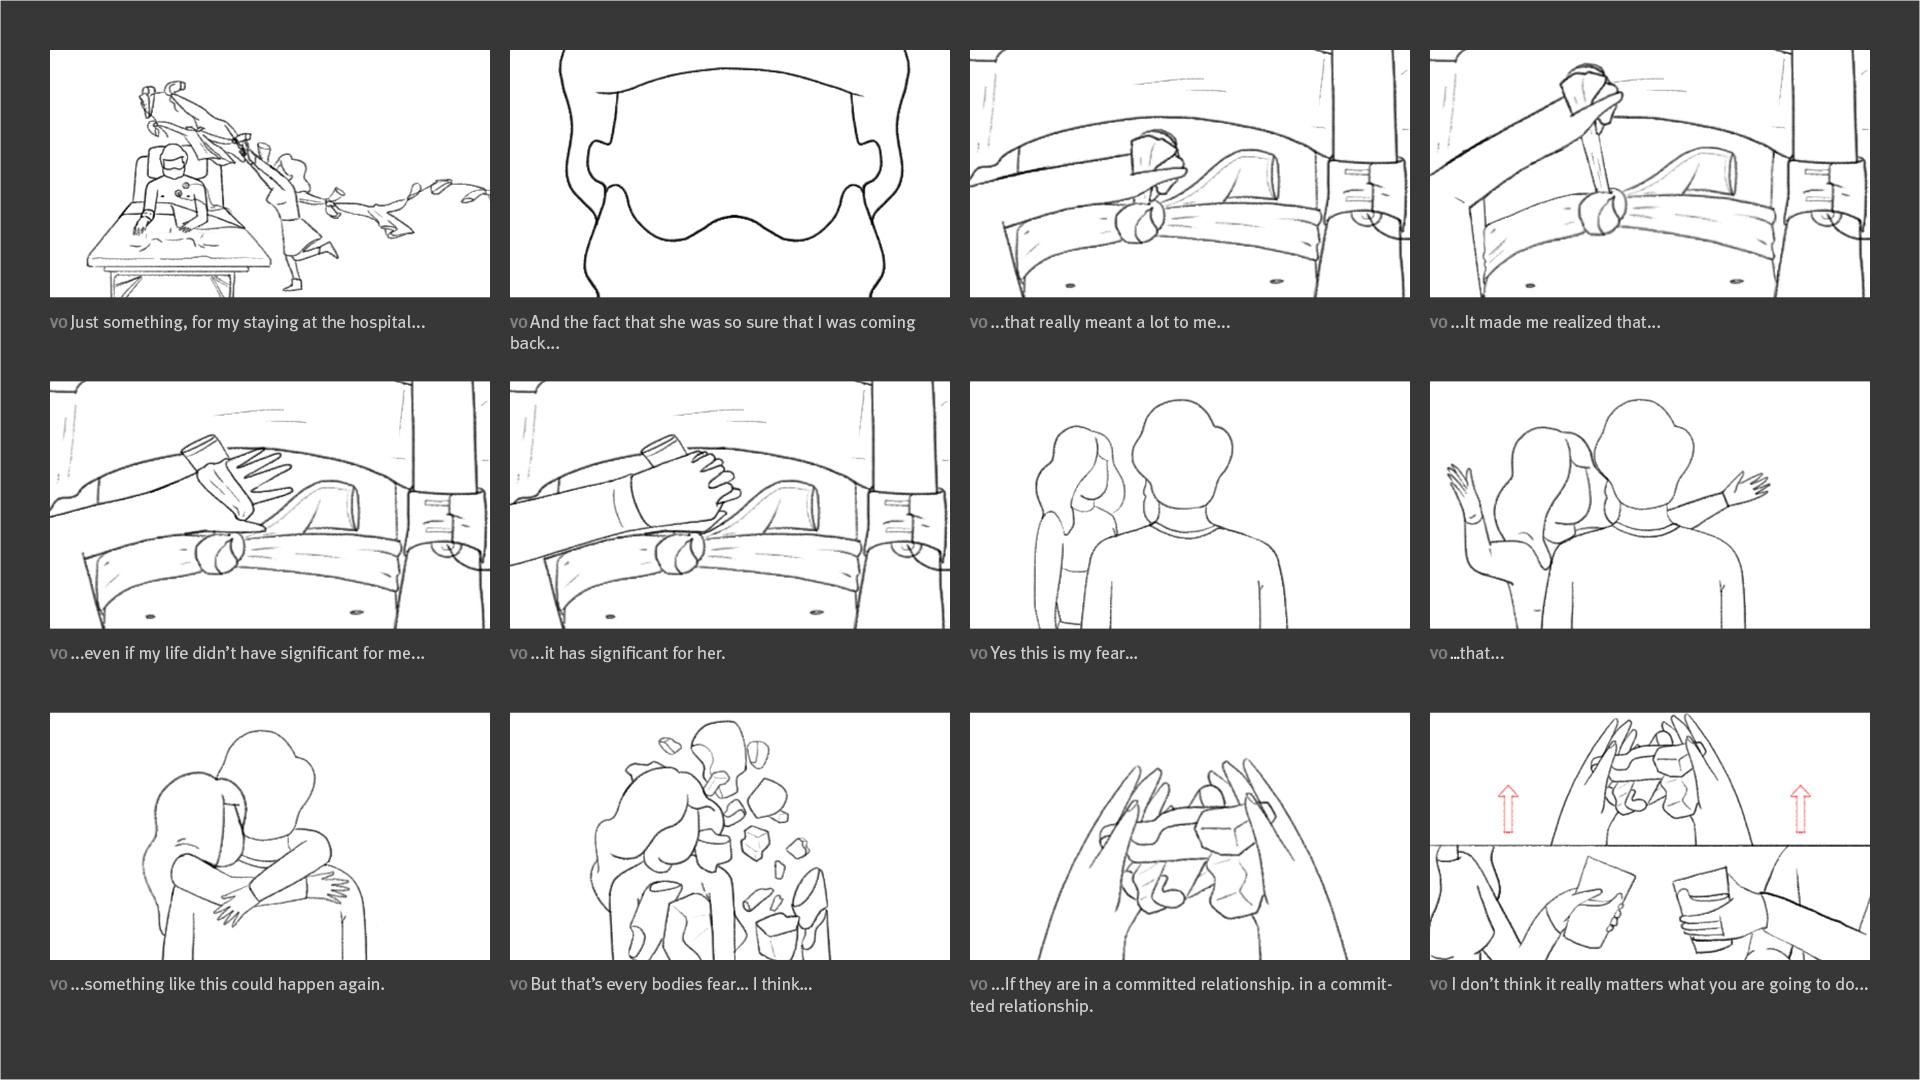 New York Times - Modern Love Storyboard 05